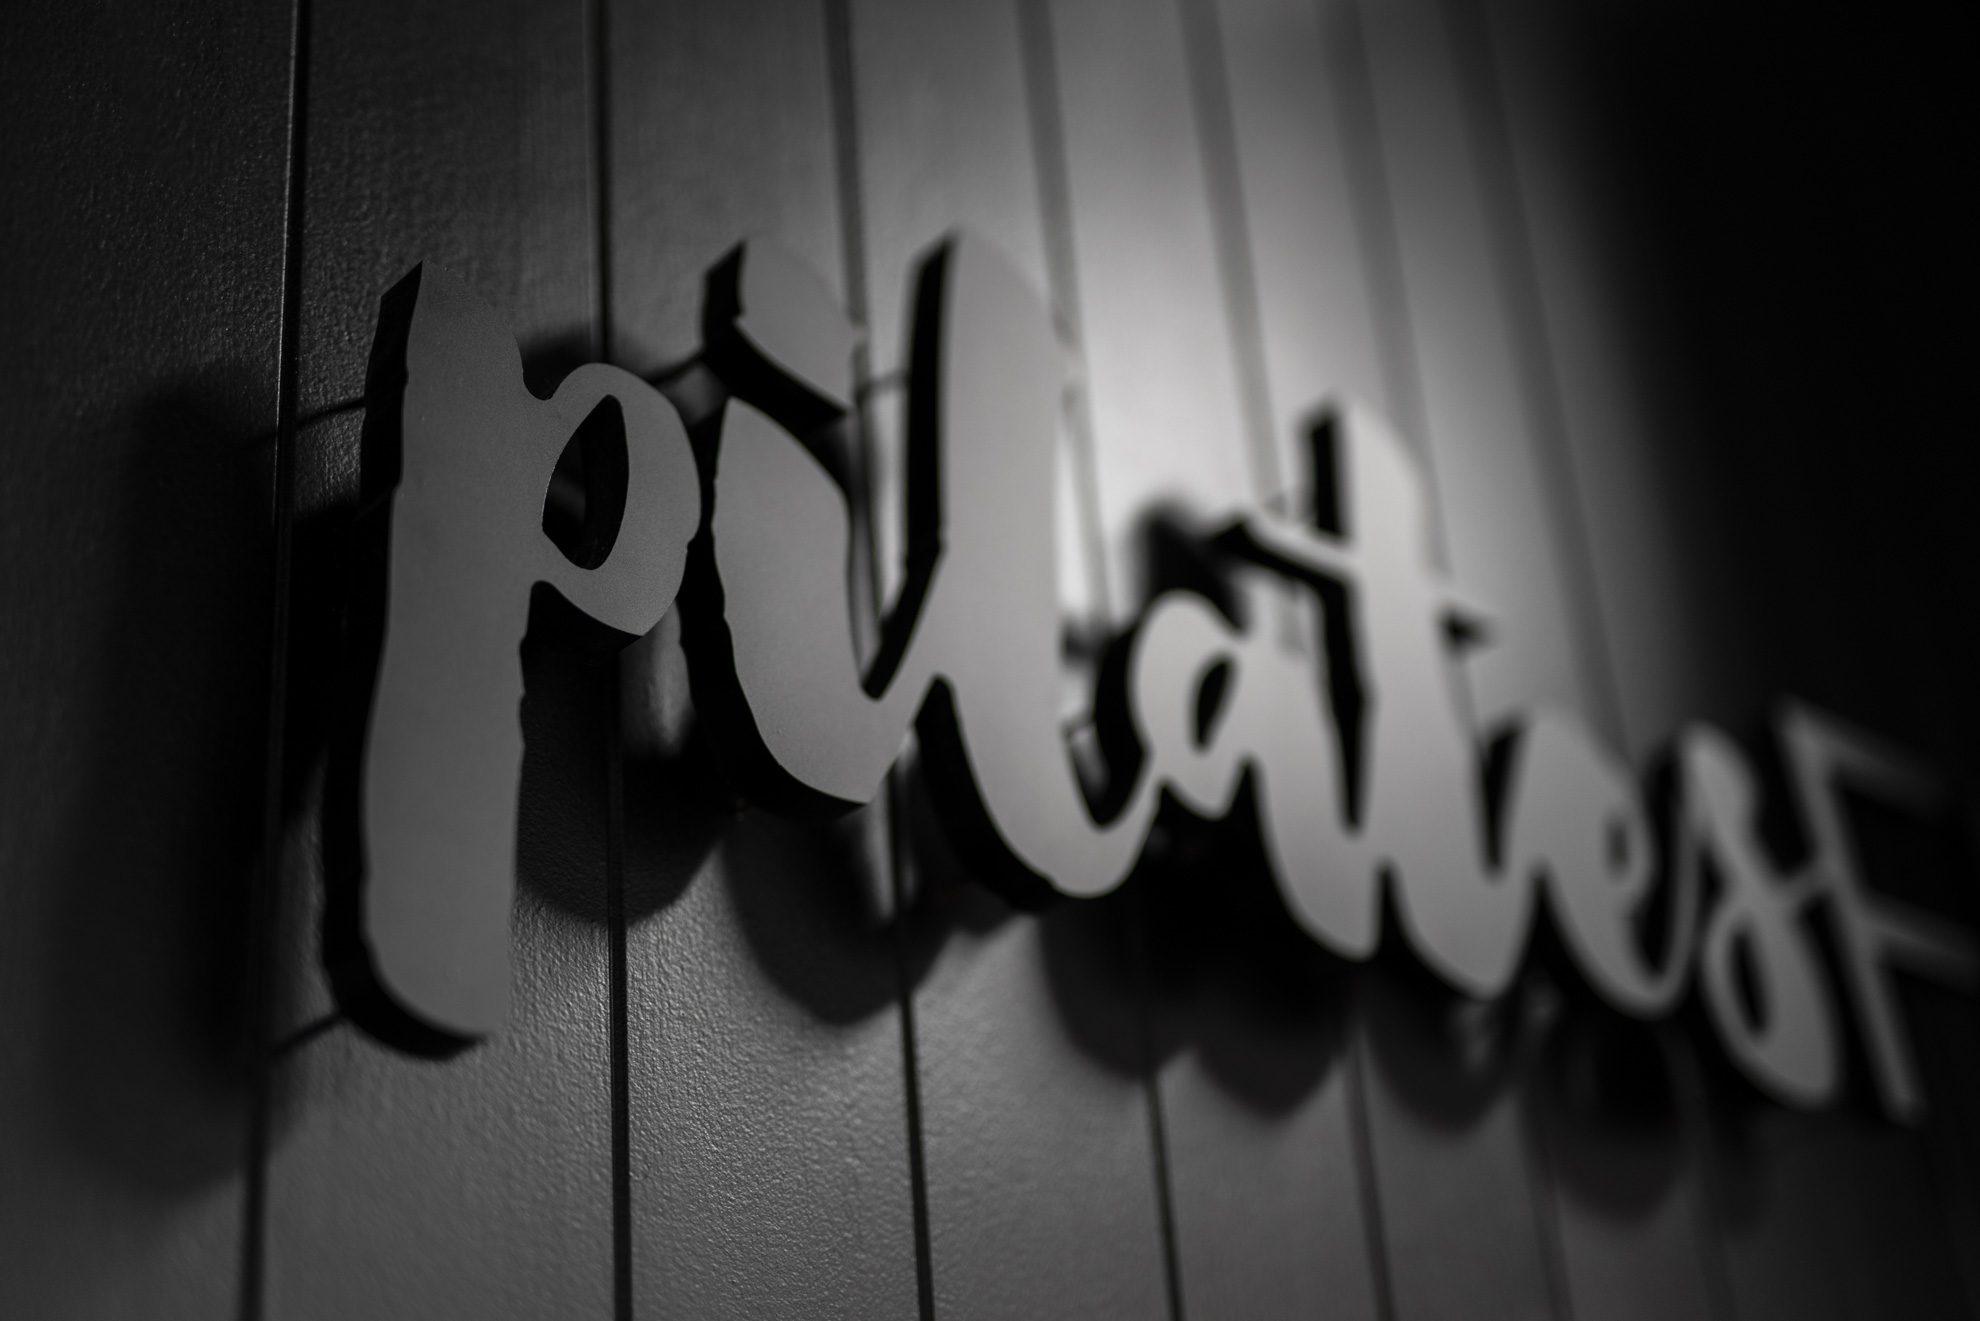 pilatesFIT signage